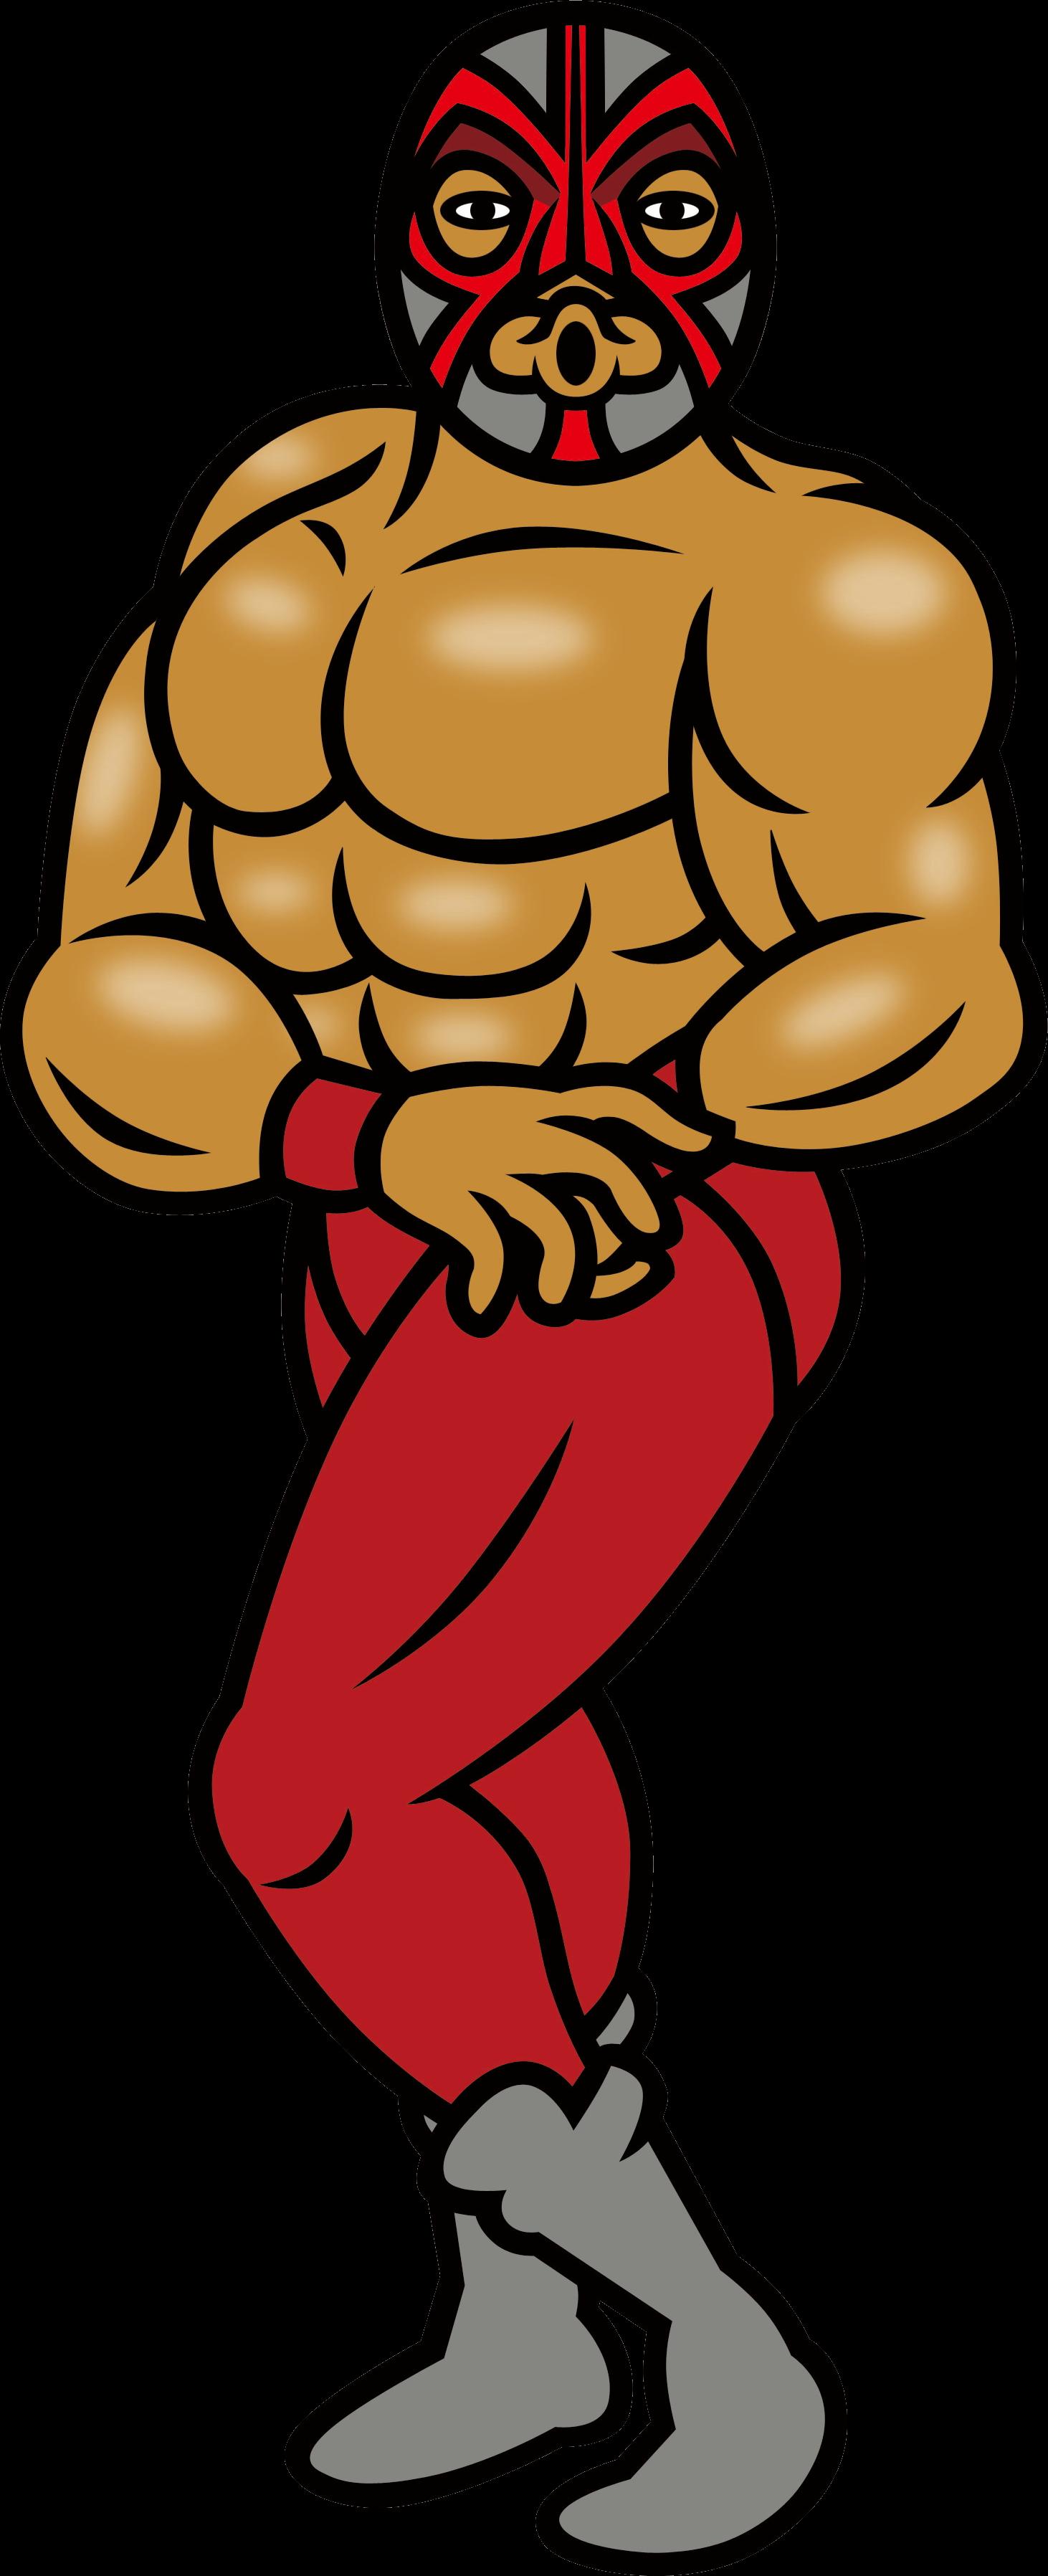 Wrestlers clipart muscular. Image wrestler wii png